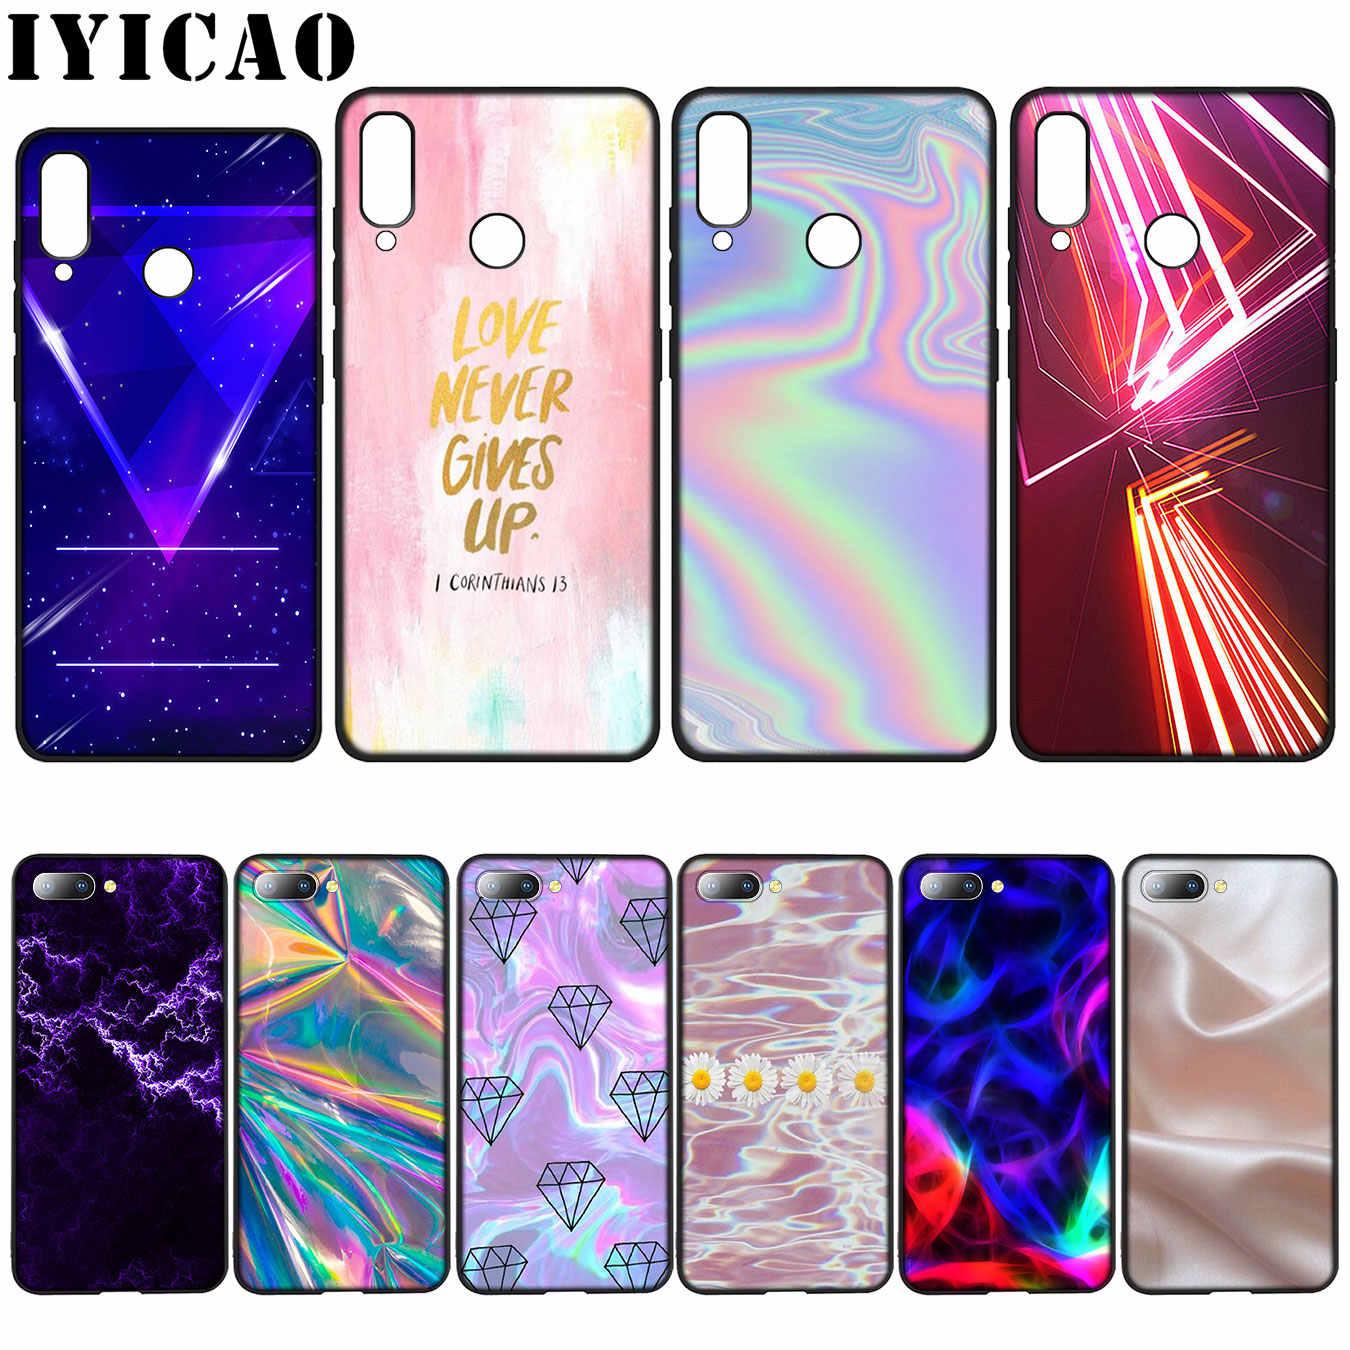 IYICAO Pastel metálico Tumblr bonito celular amor funda para Huawei Y7 Y6  Prime Y9 2018 Honor 8C 8X8 9 10 Lite 6A 7C 7X 7A Pro| | - AliExpress